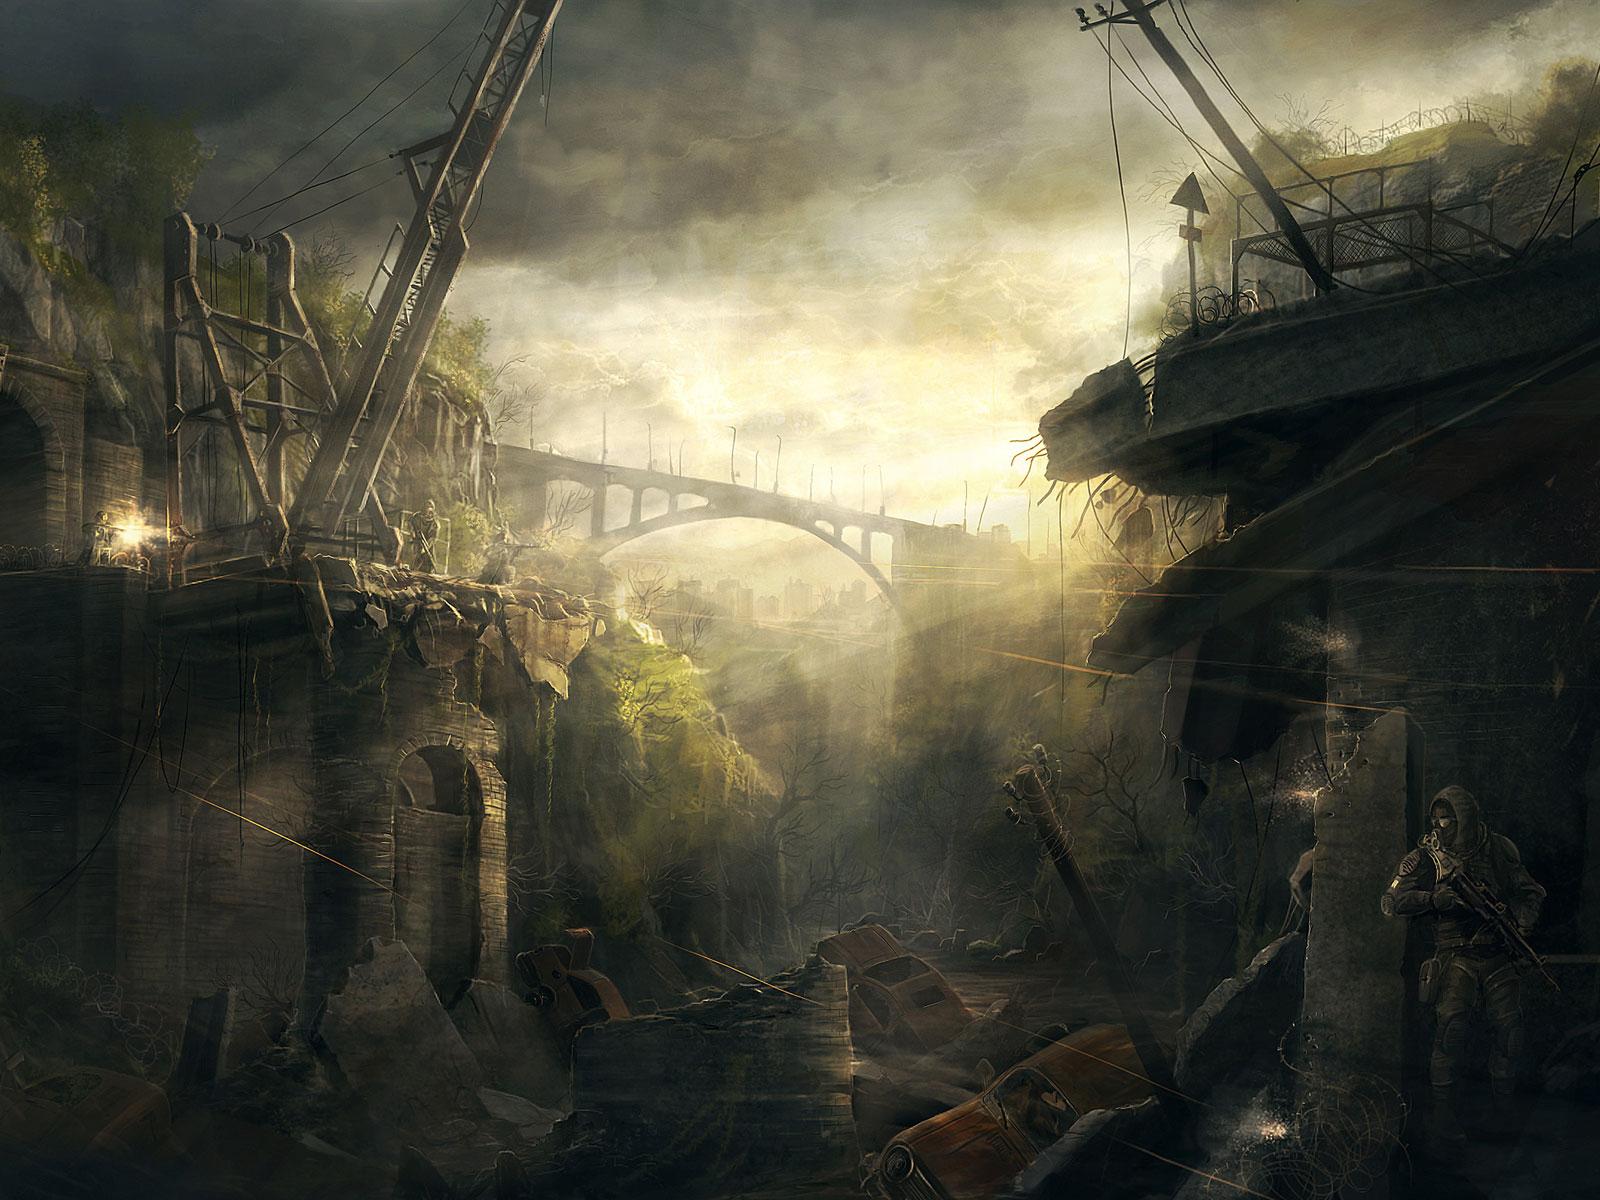 best wallpapers apocalyptic destruction wallpapers